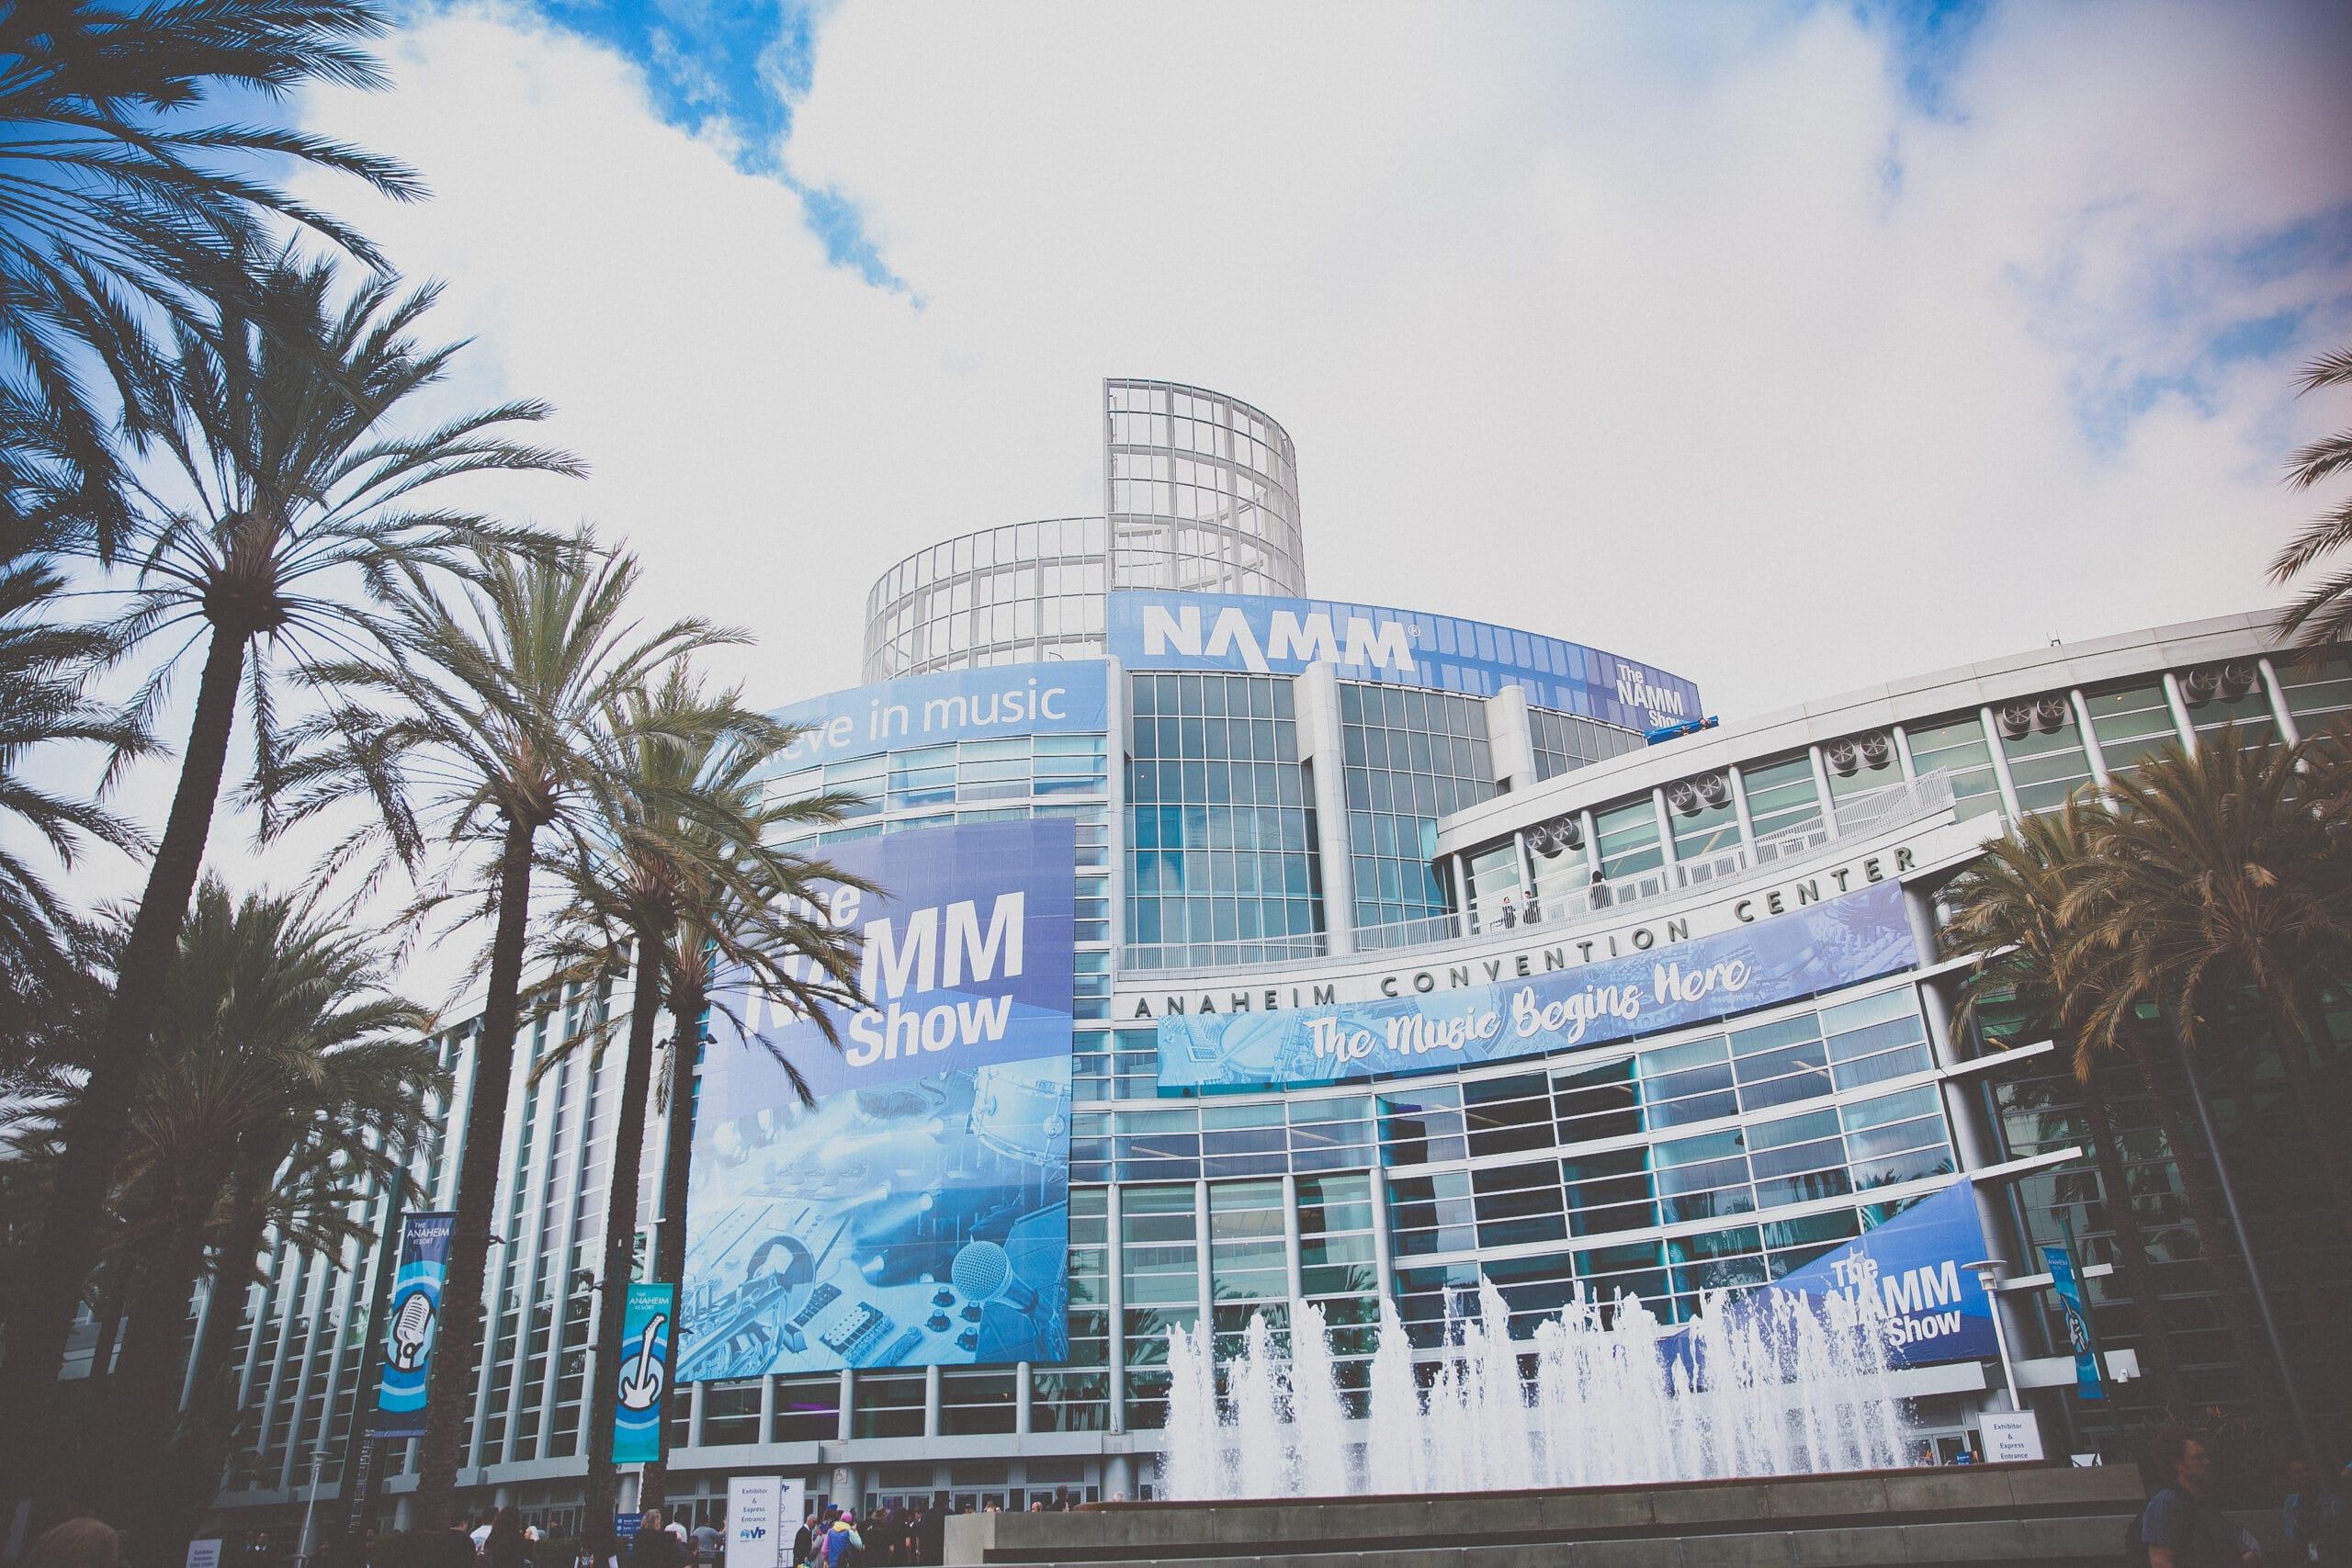 NAMM 2020: Part 1